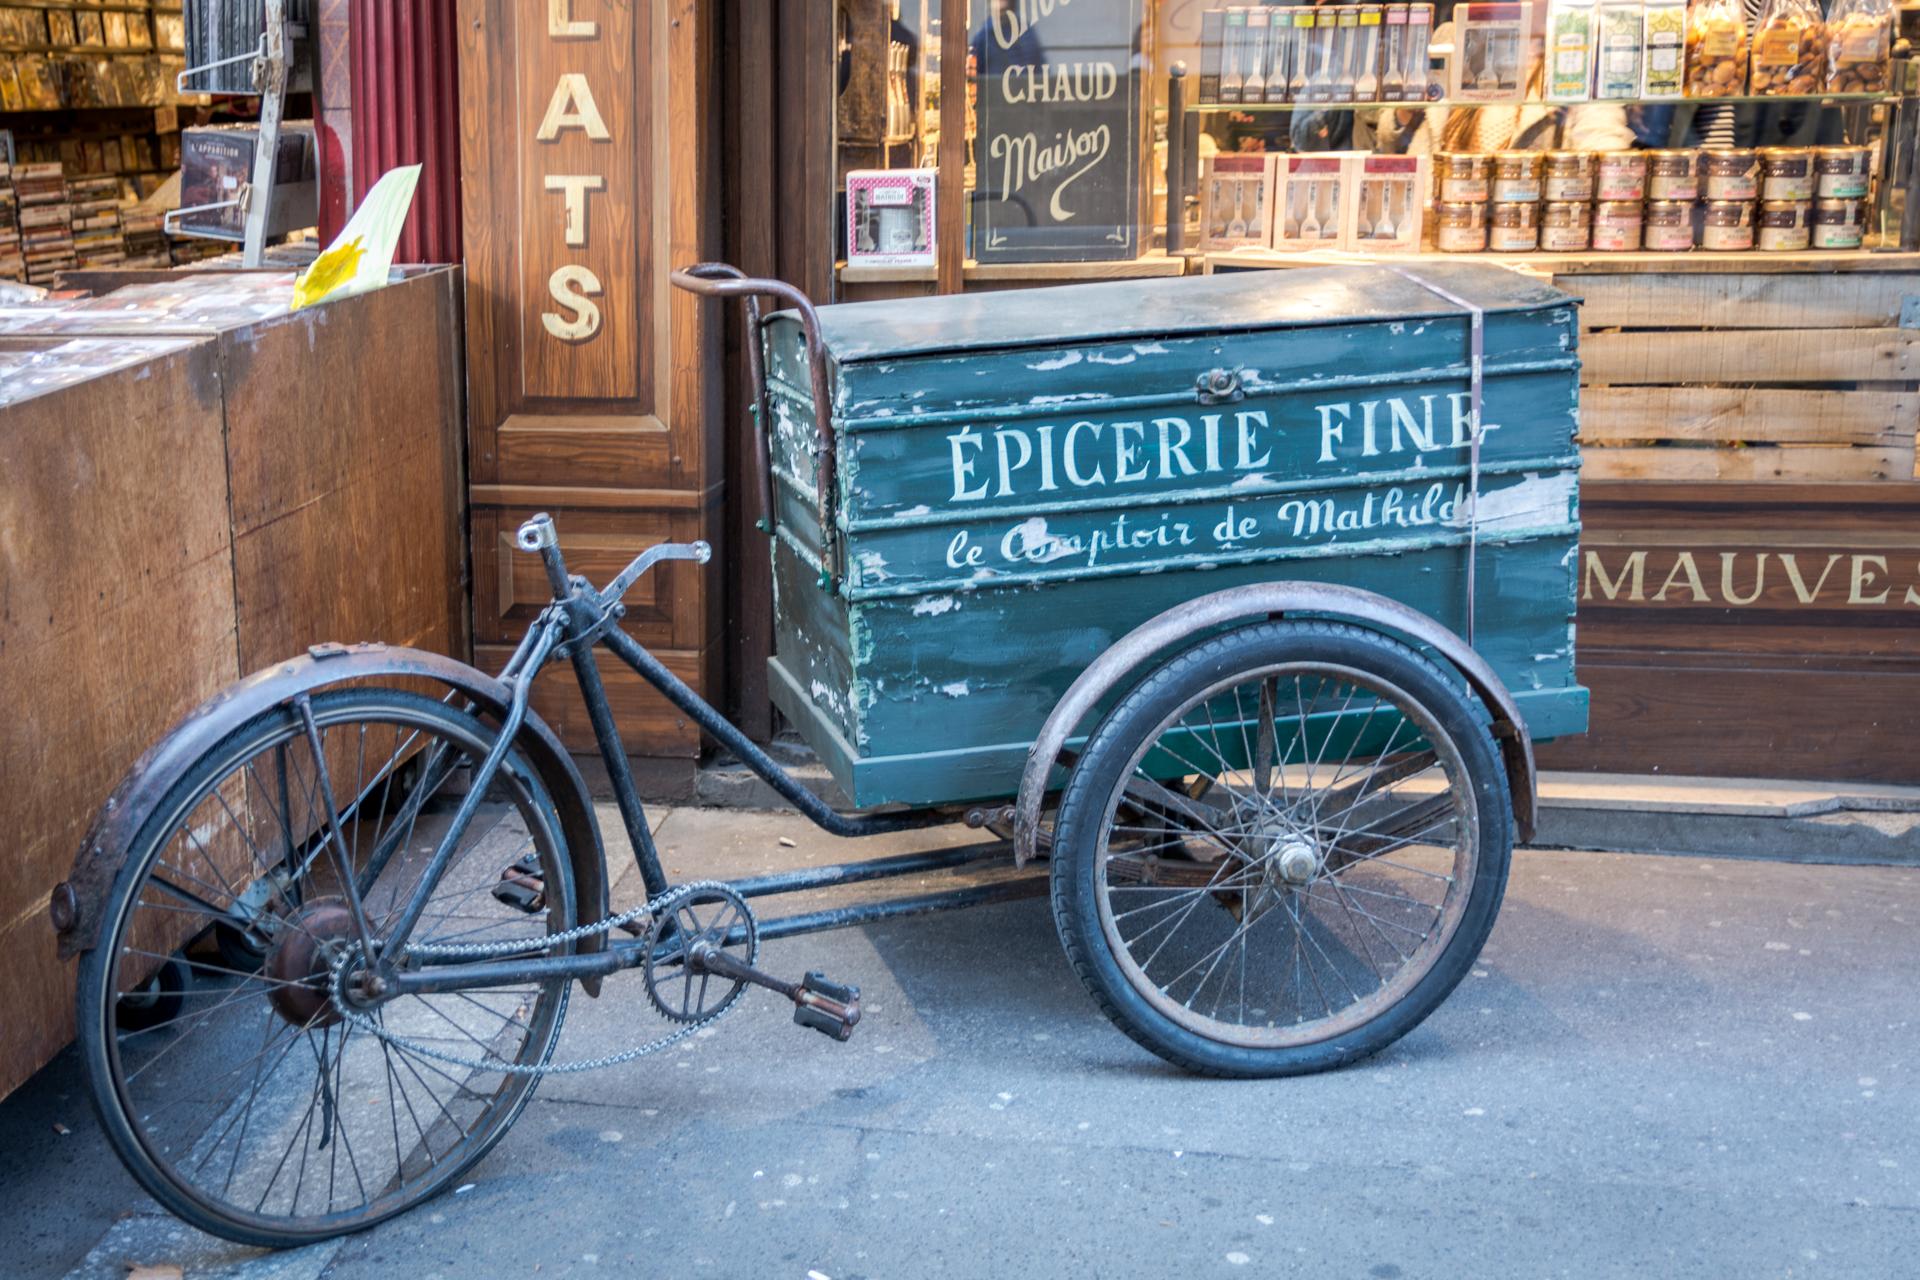 Street photography - Epicerie fine